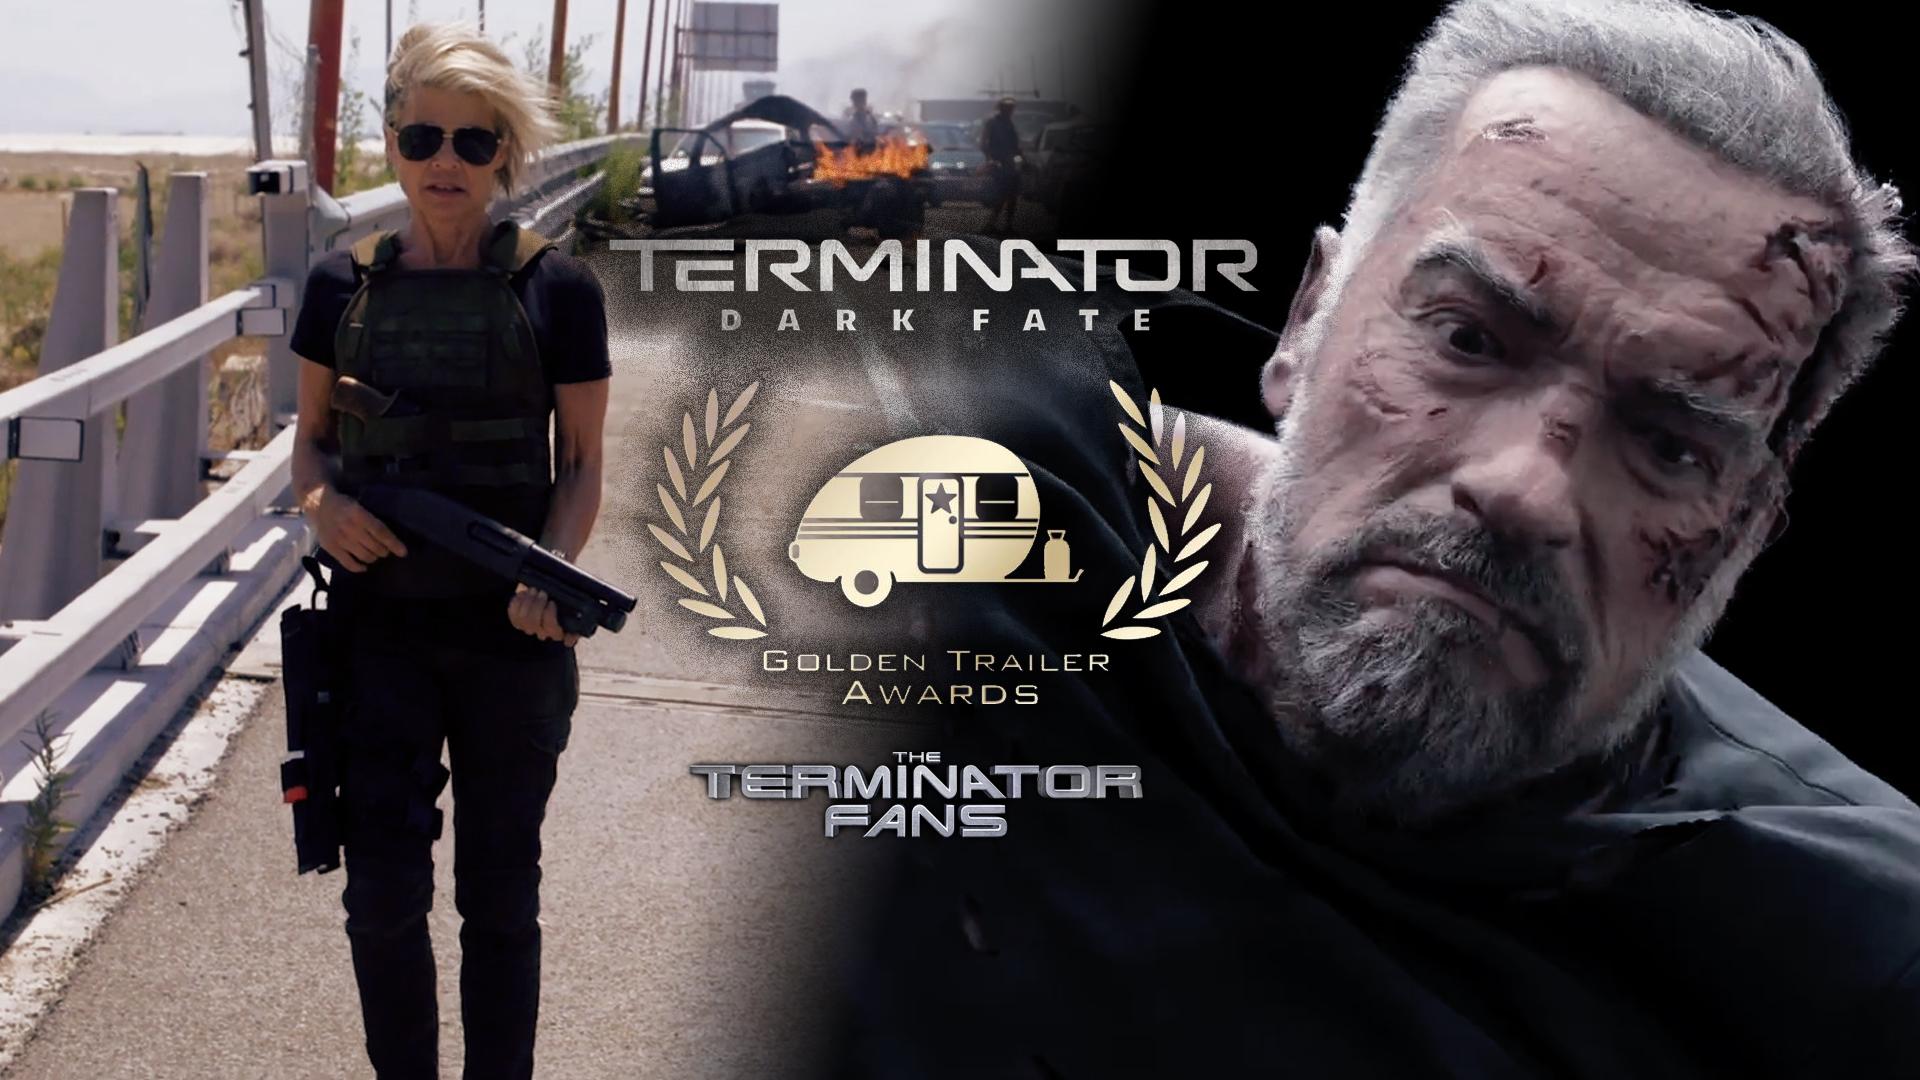 Terminator: Dark Fate Golden Trailer Awards